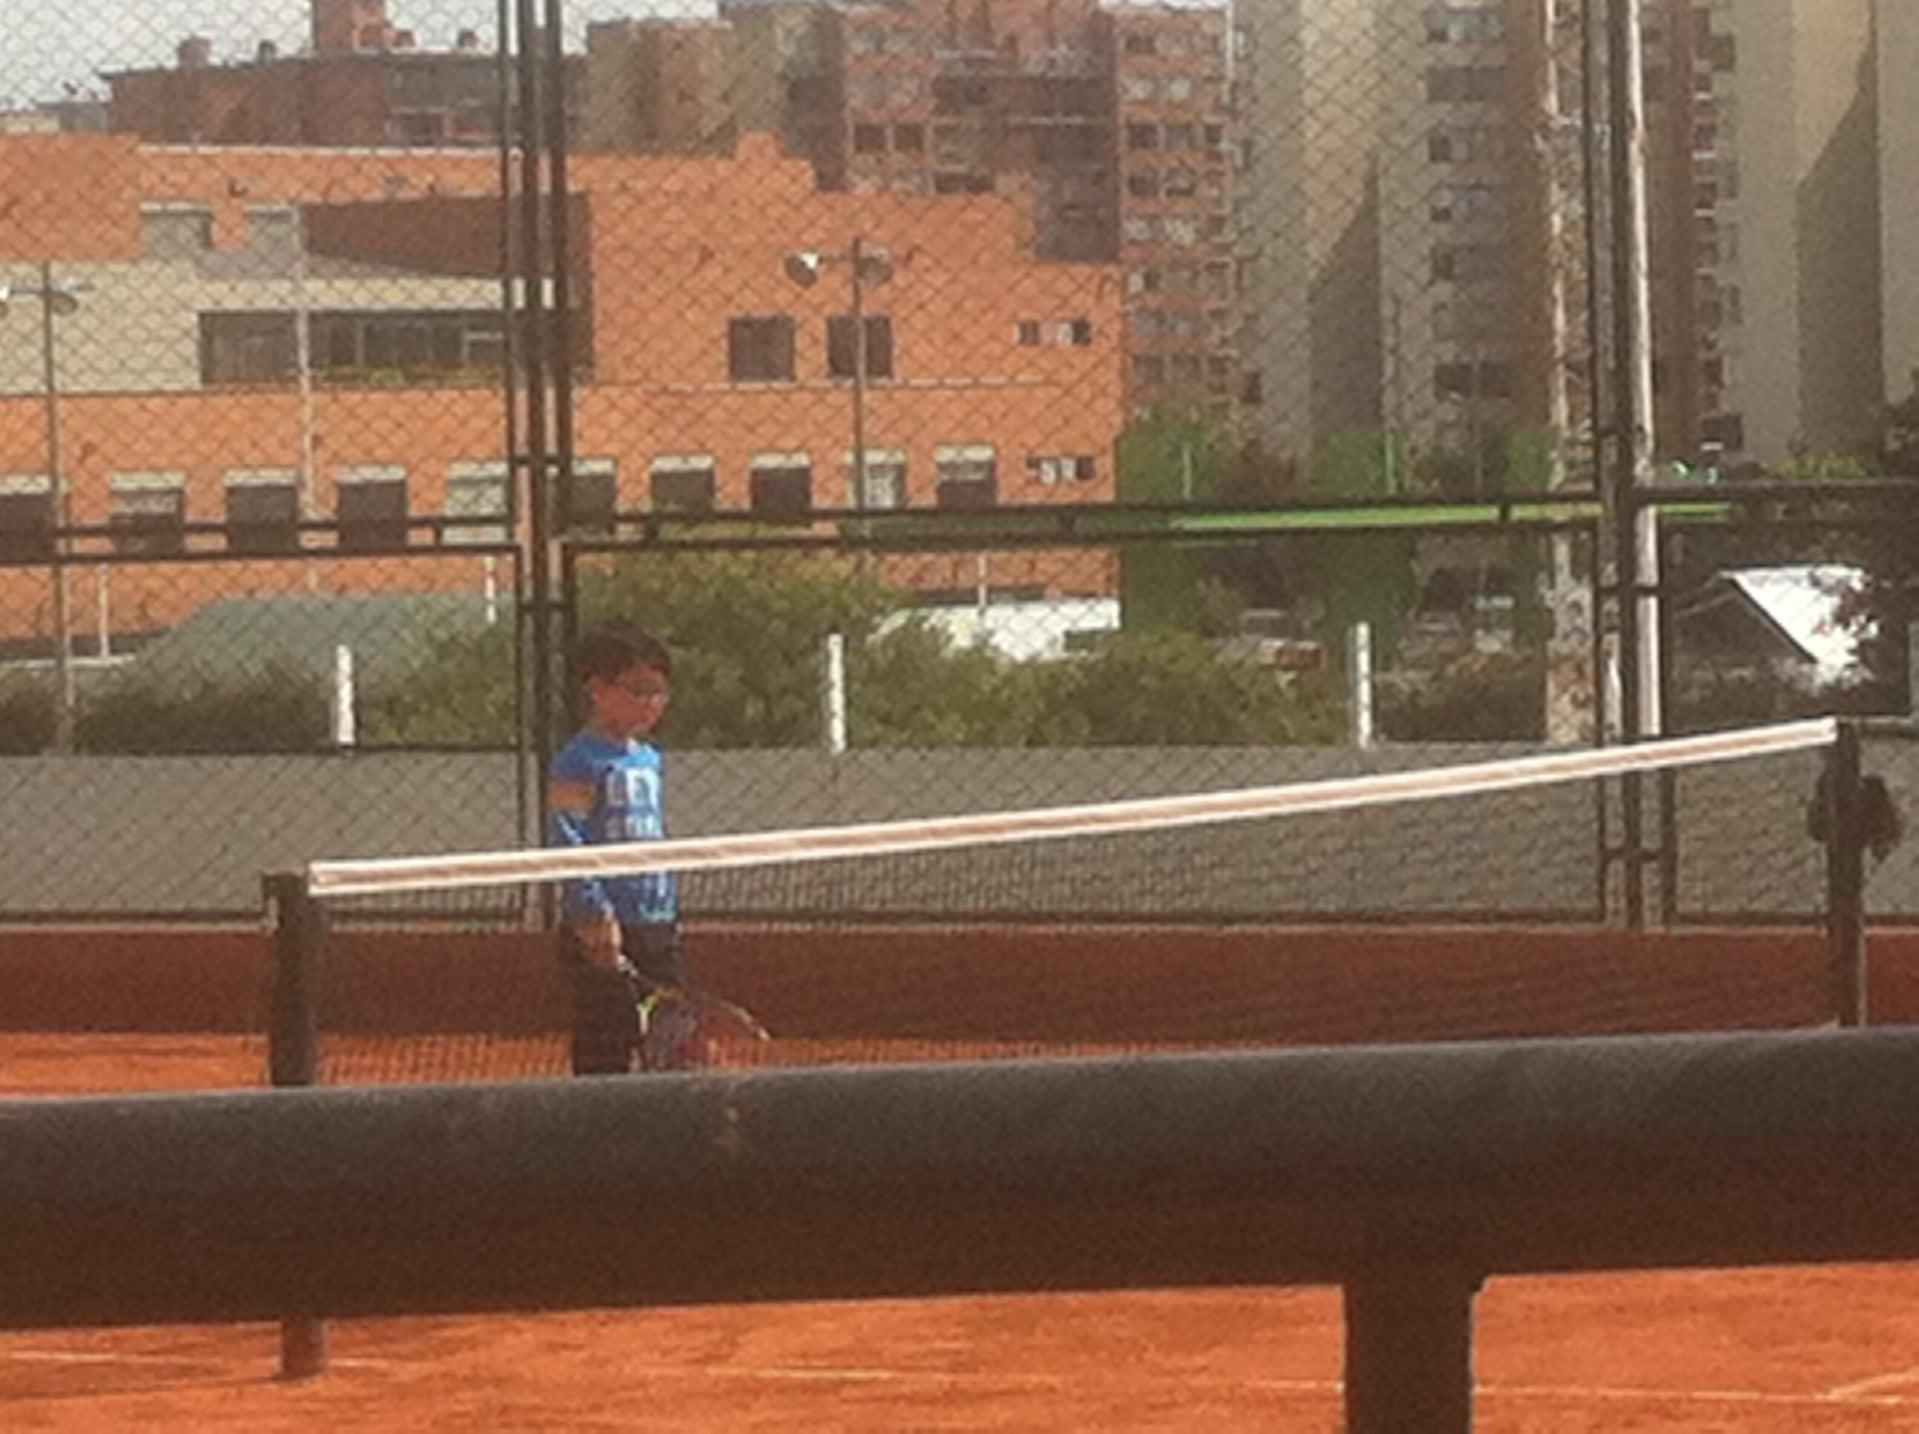 Club la colina colsubsidio clubes deportivos iberia for Polideportivo ciudad jardin